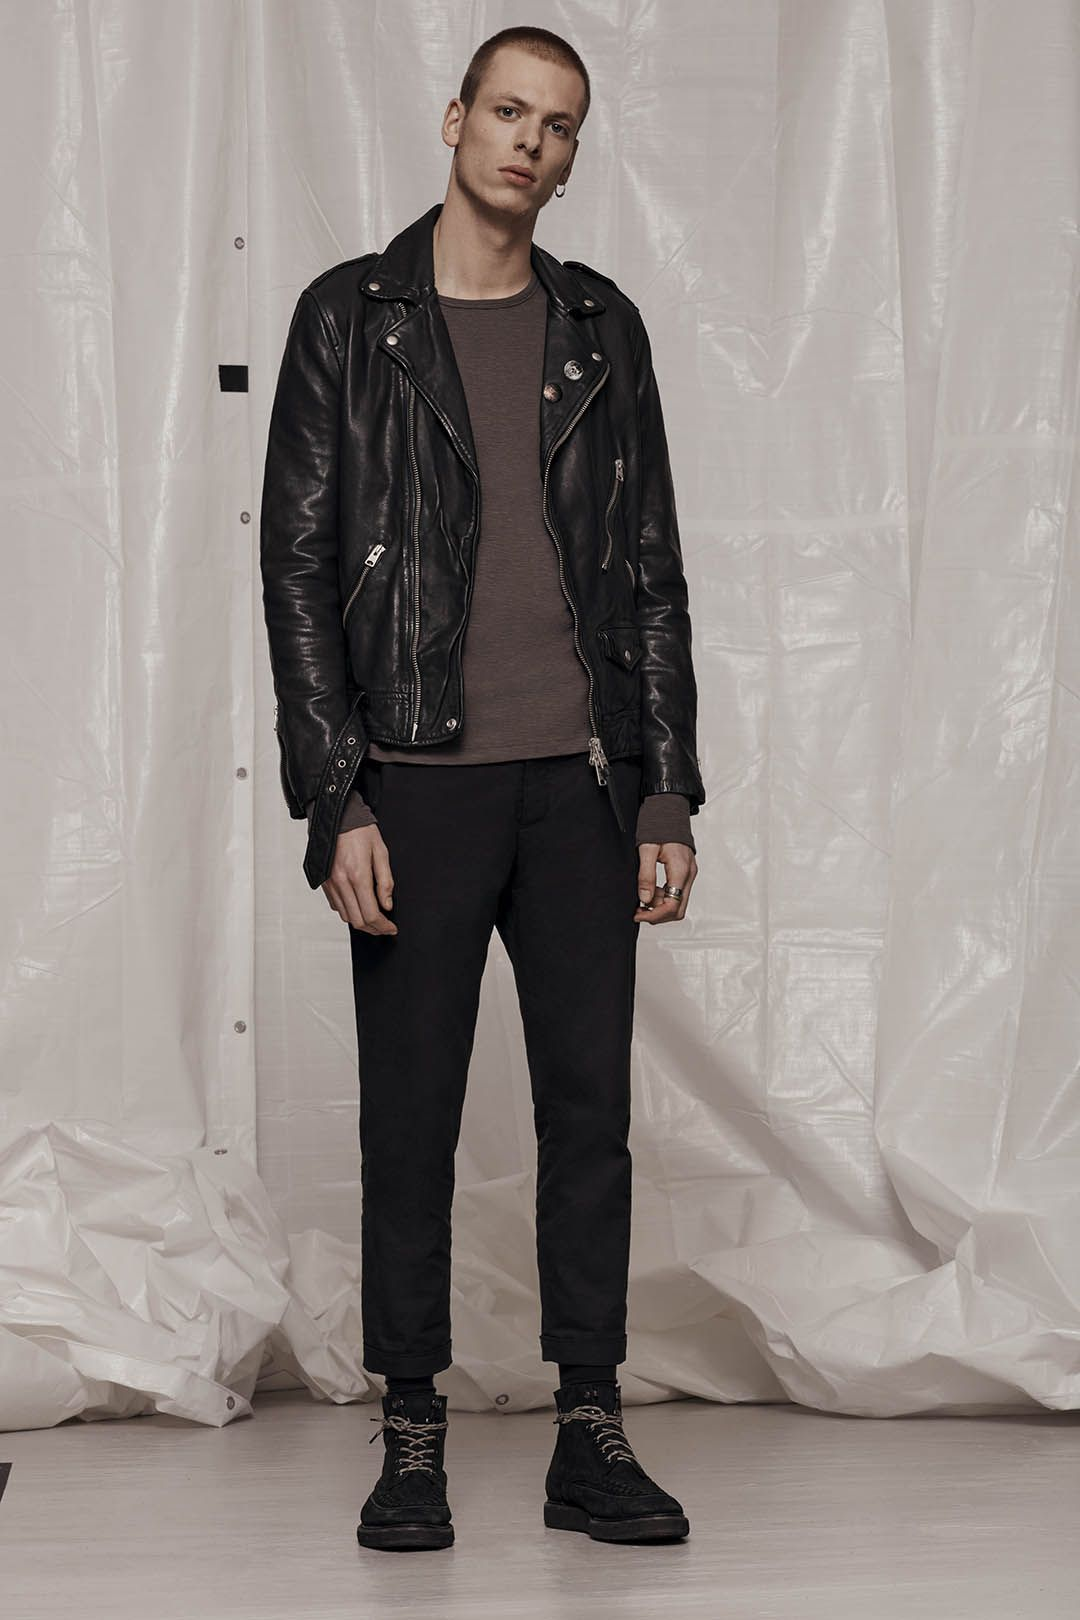 AllSaints Men's January Lookbook Look 5 Volt Leather